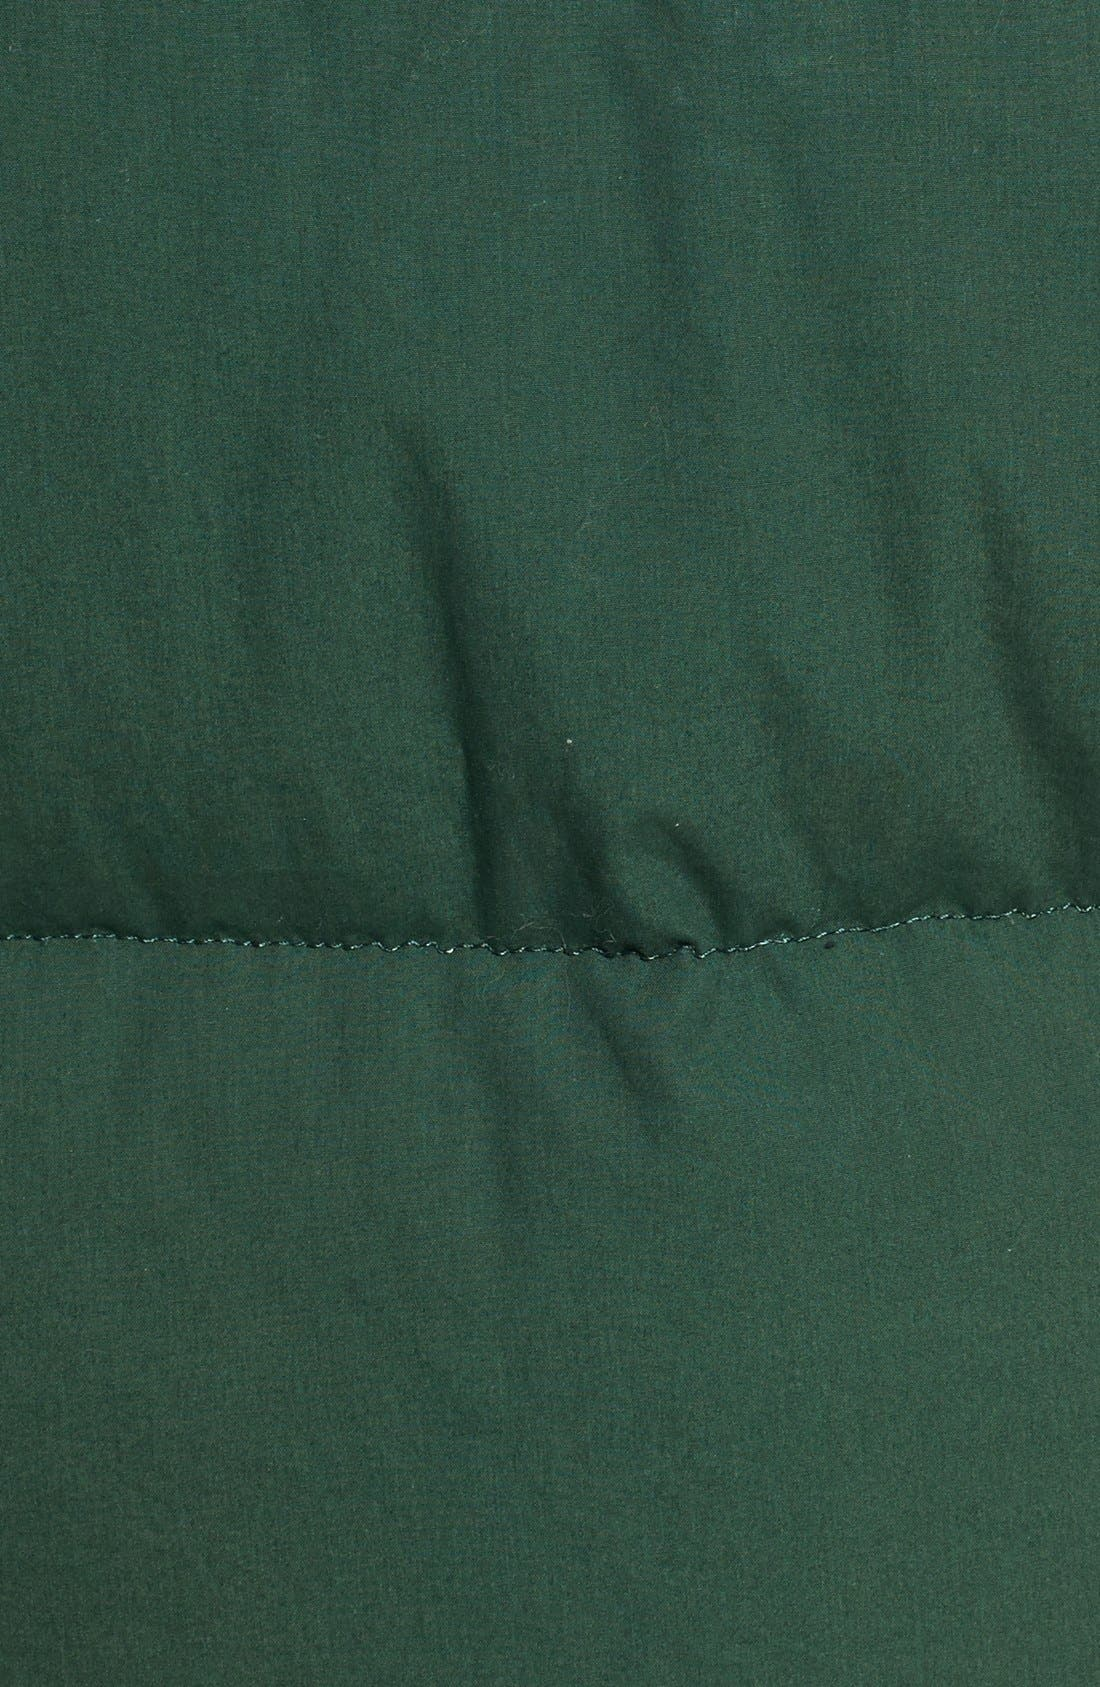 Alternate Image 3  - Woolrich 'Sierra Supreme' Quilted Down Jacket